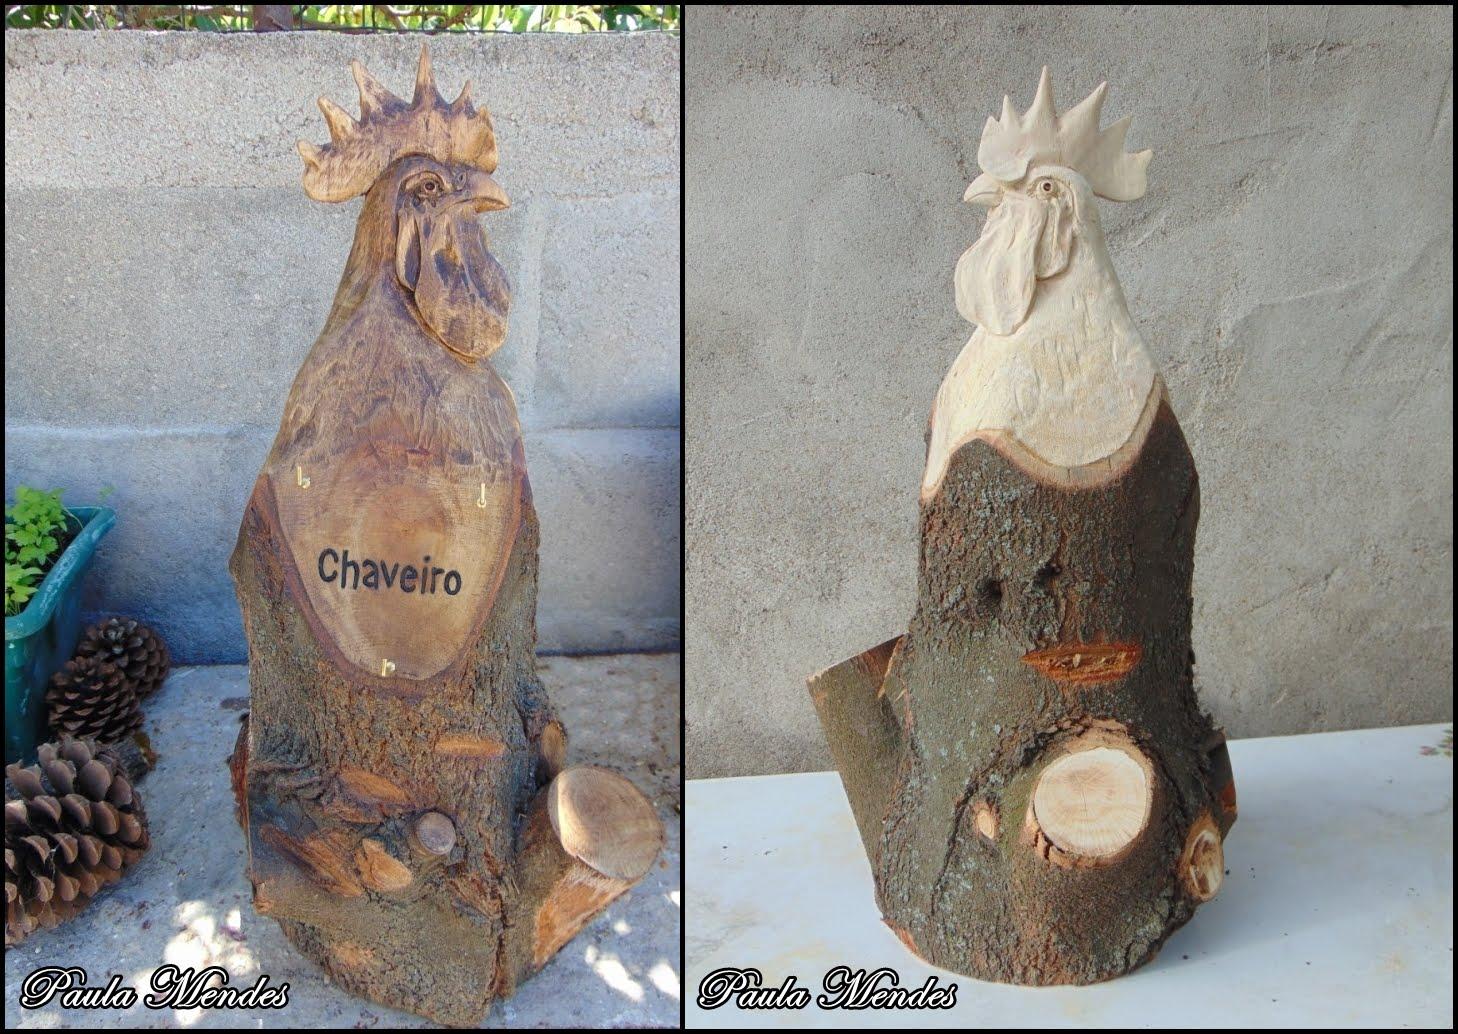 Galo Chaveiro